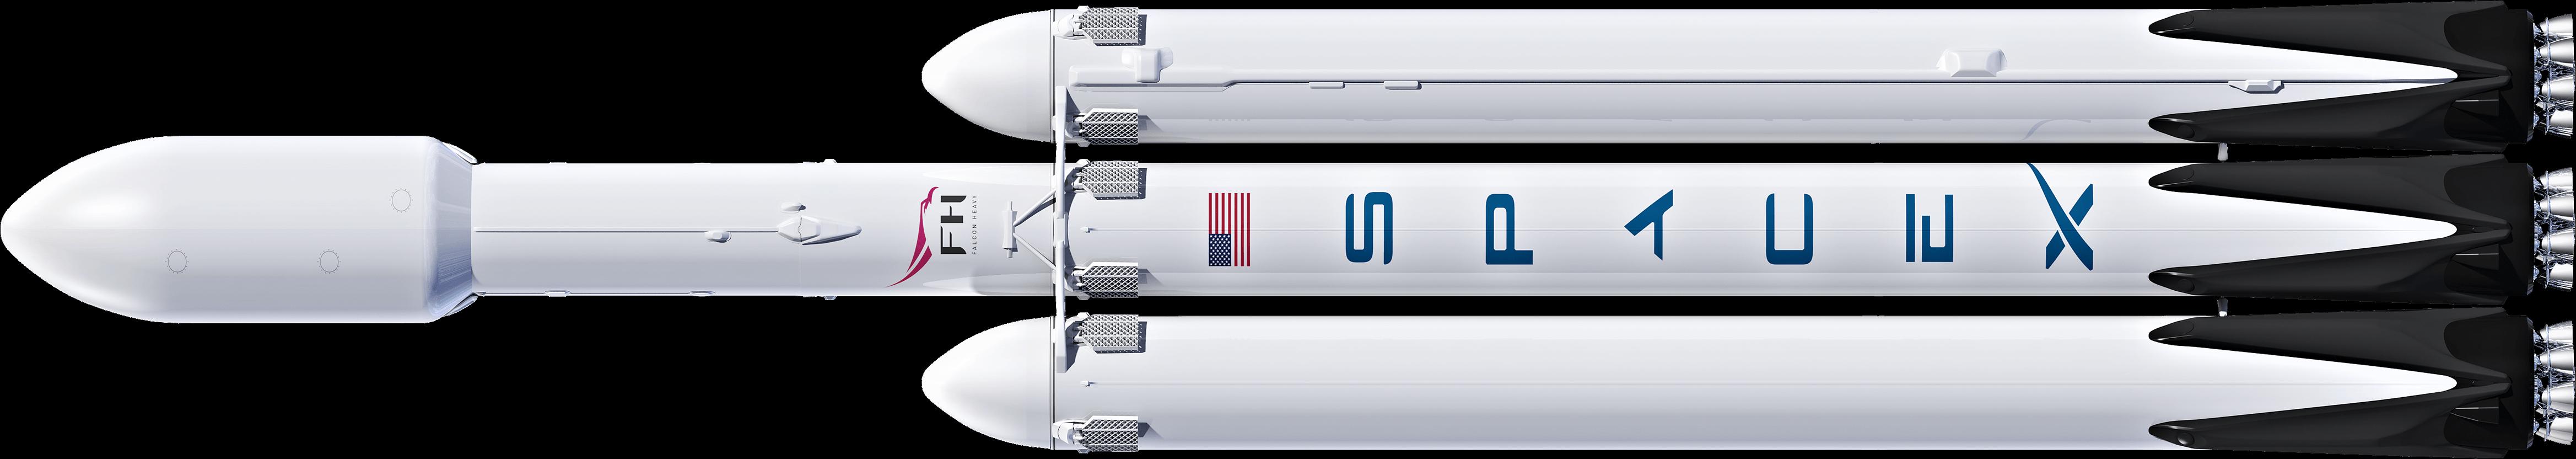 Falcon Heavy Block 2-4 (SpaceX) 1 edit (c)